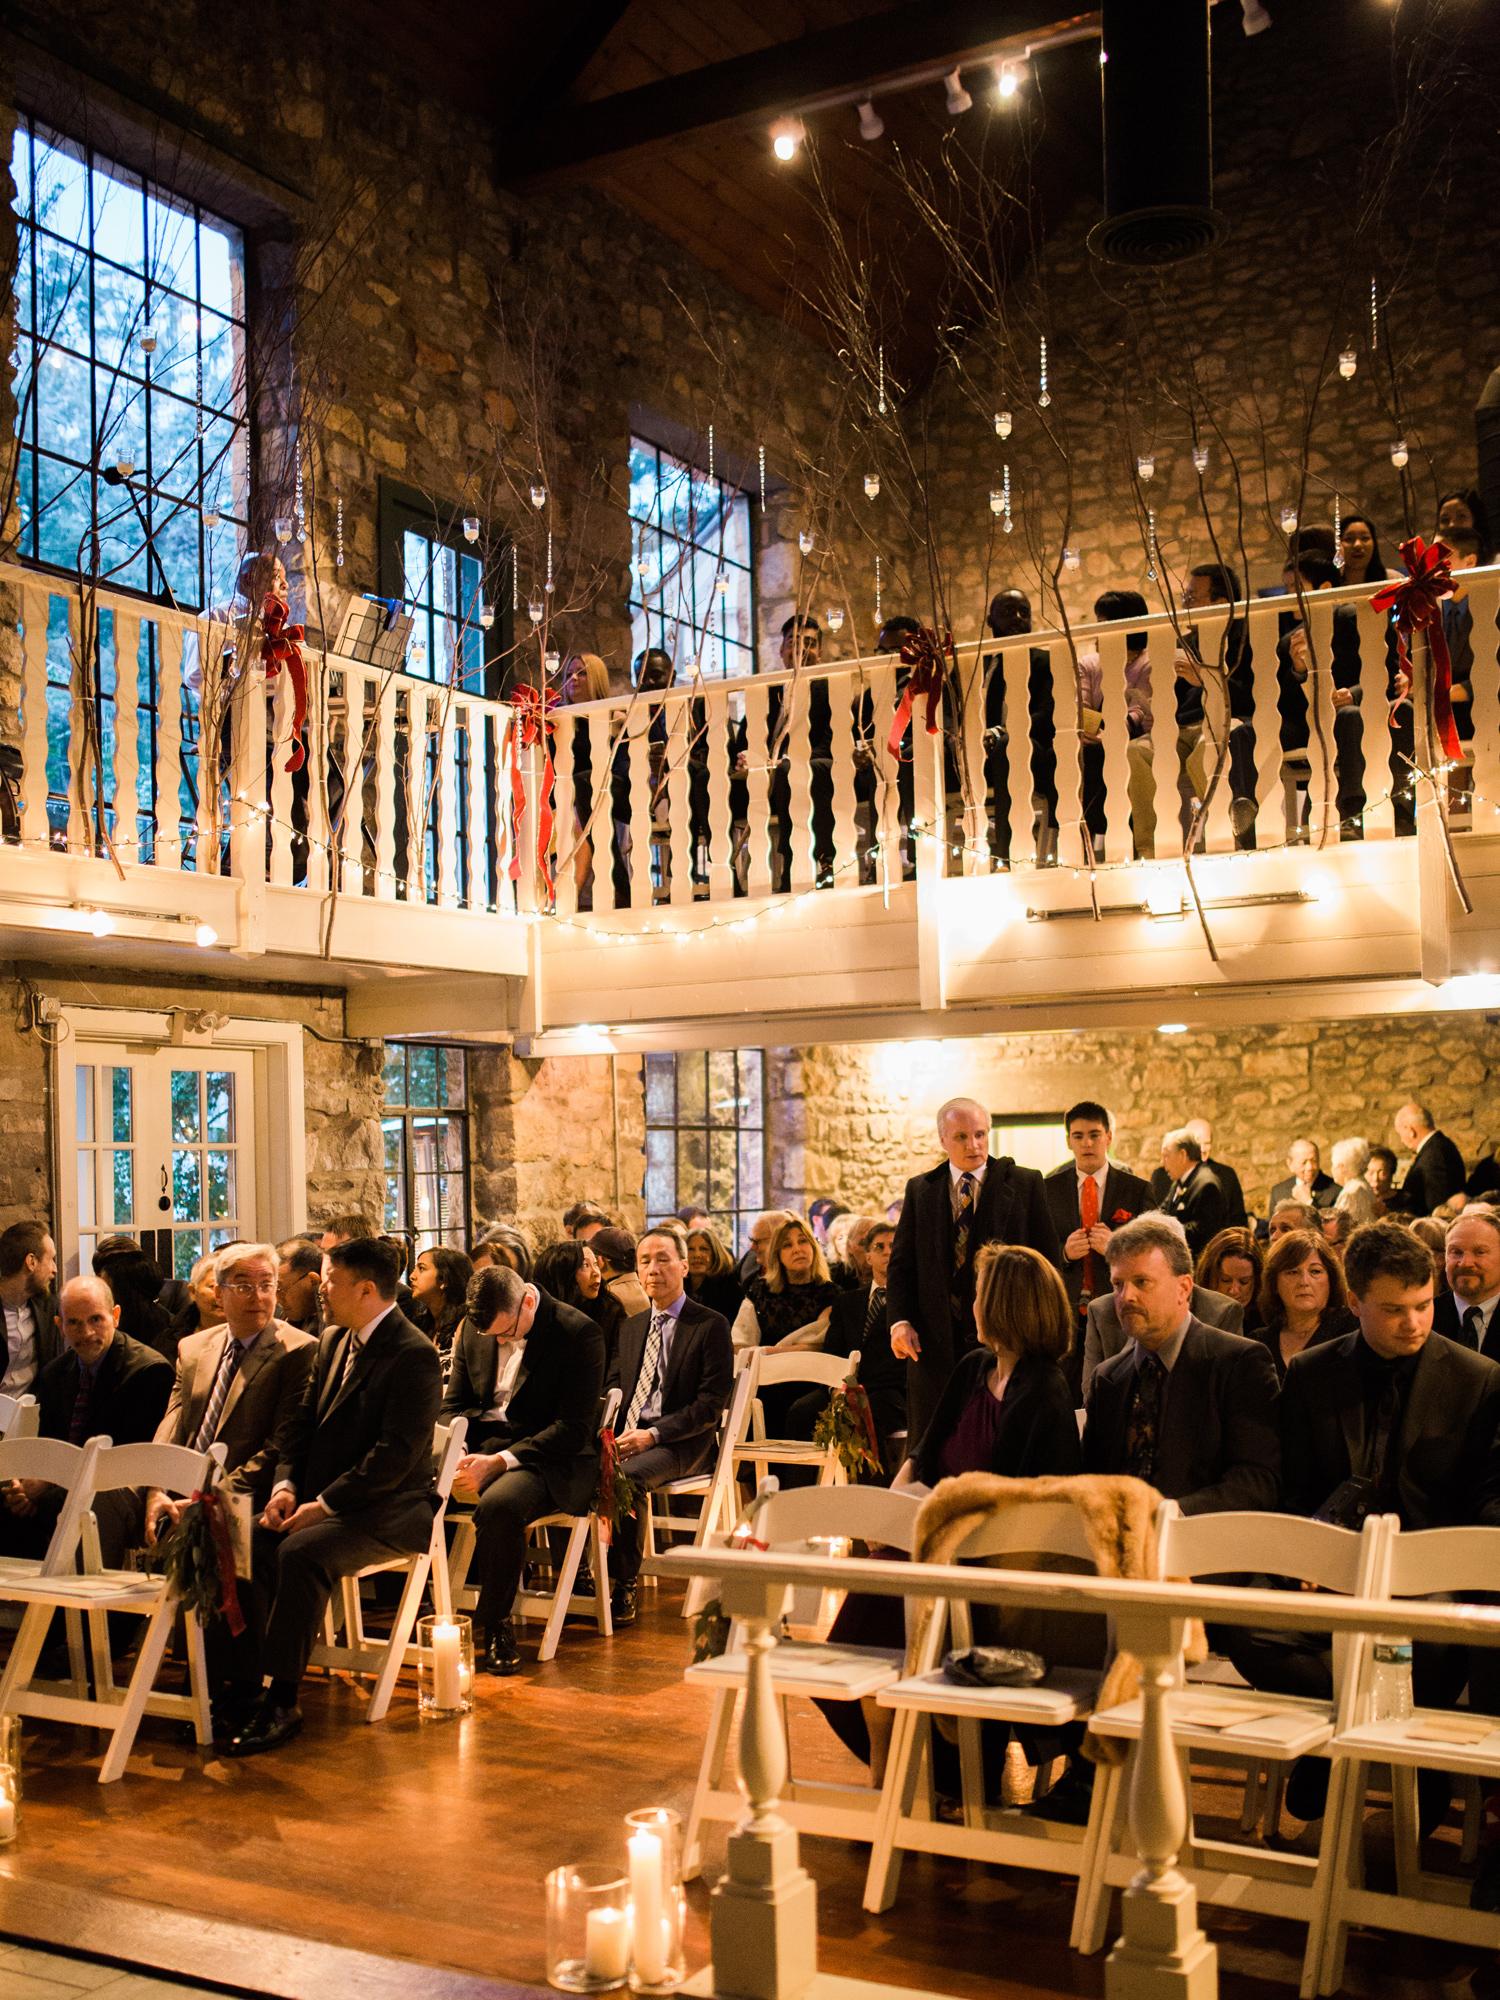 Siousca_Photography_Philadelphia_wedding_Photographer_Holly_Hedge_estate_new_hope_west_chester_23.jpg